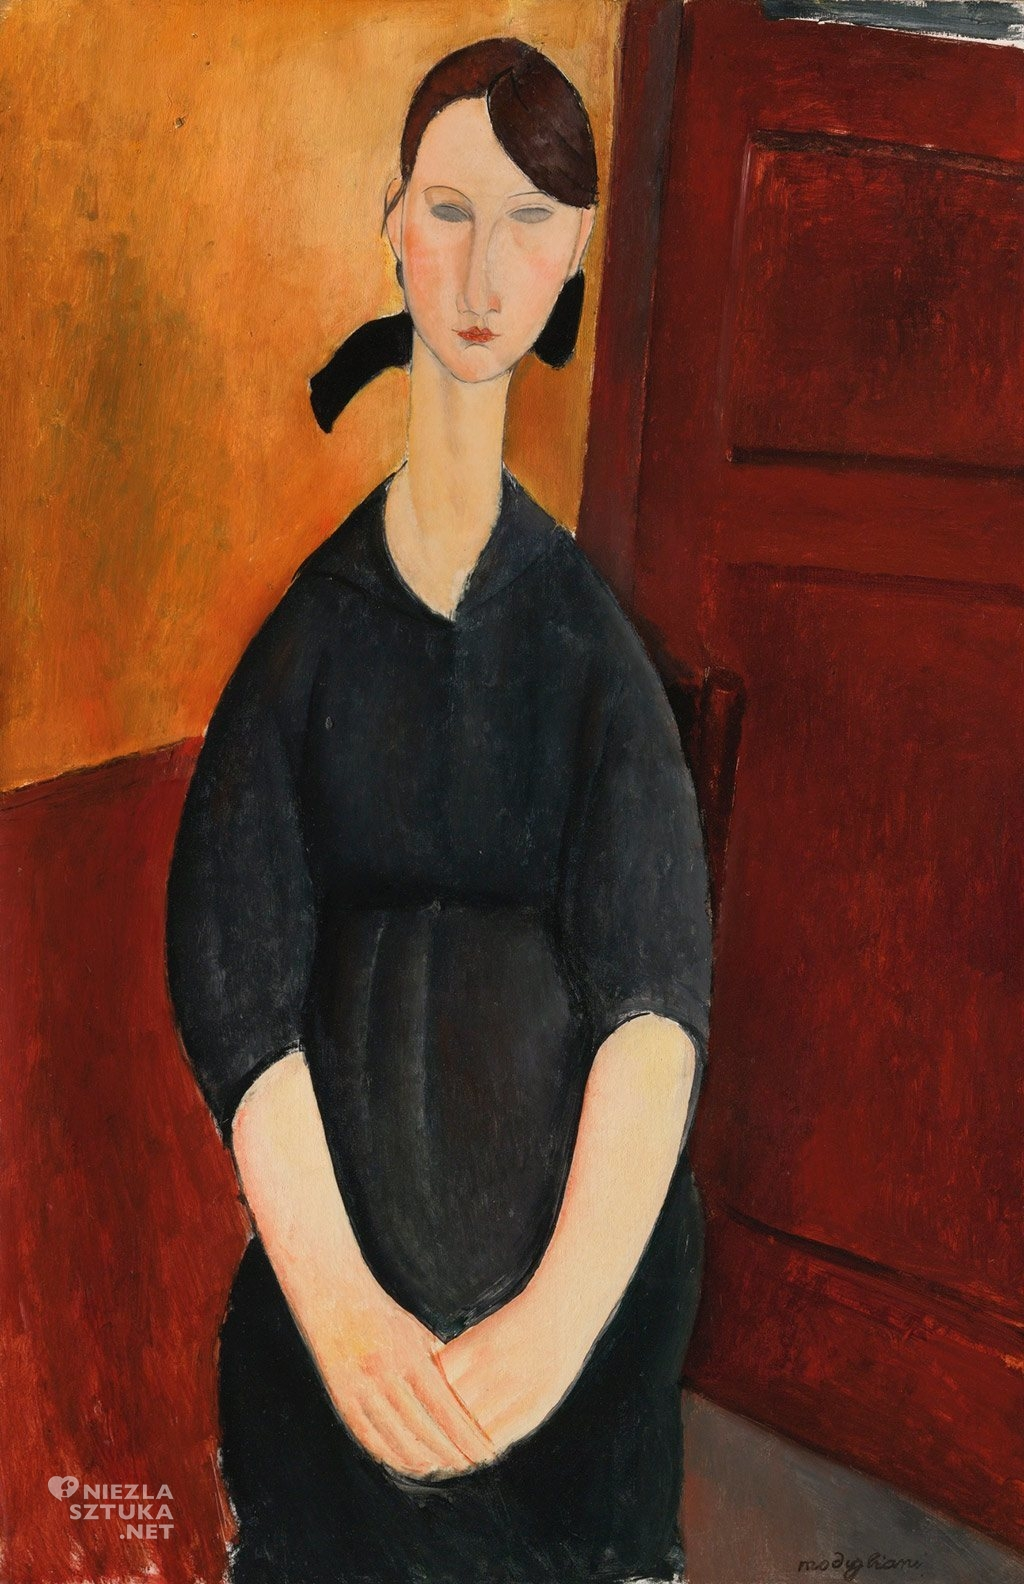 Amedeo Modigliani Portret Paulette Jourdain | 1919, sothebys.com